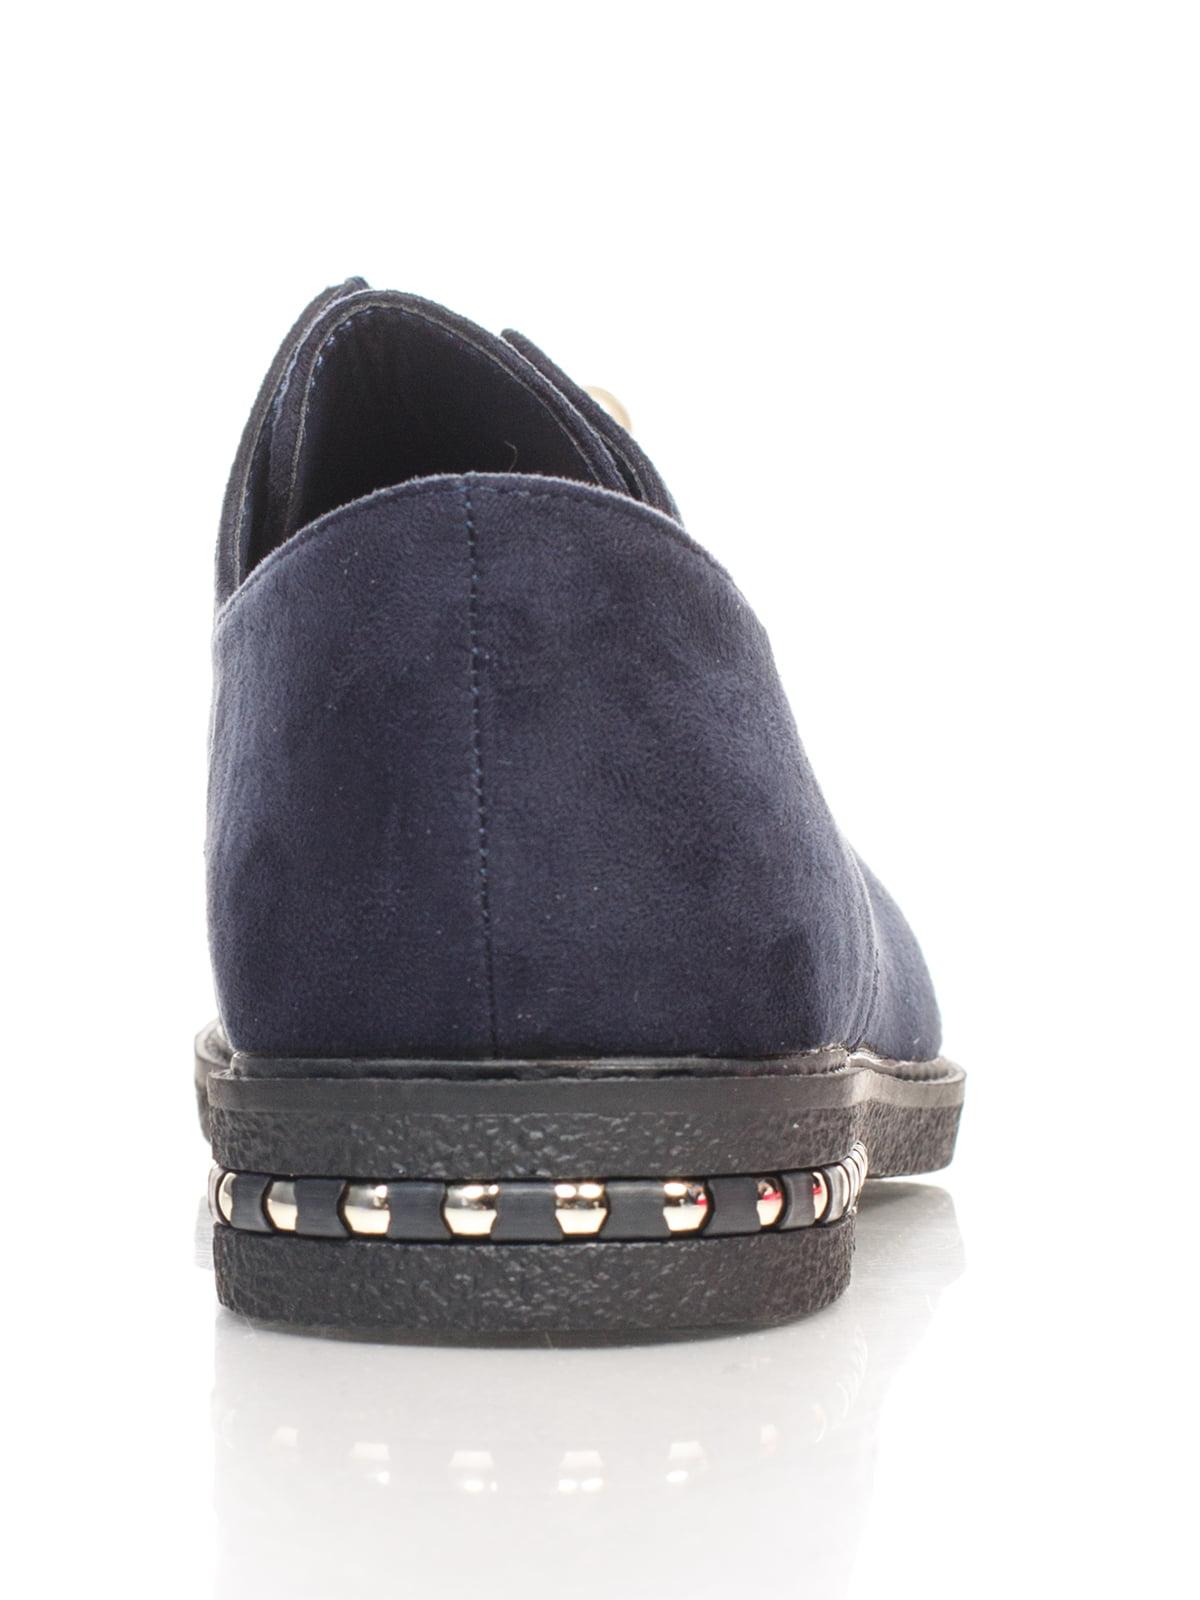 Туфли синие с декором | 4605868 | фото 3